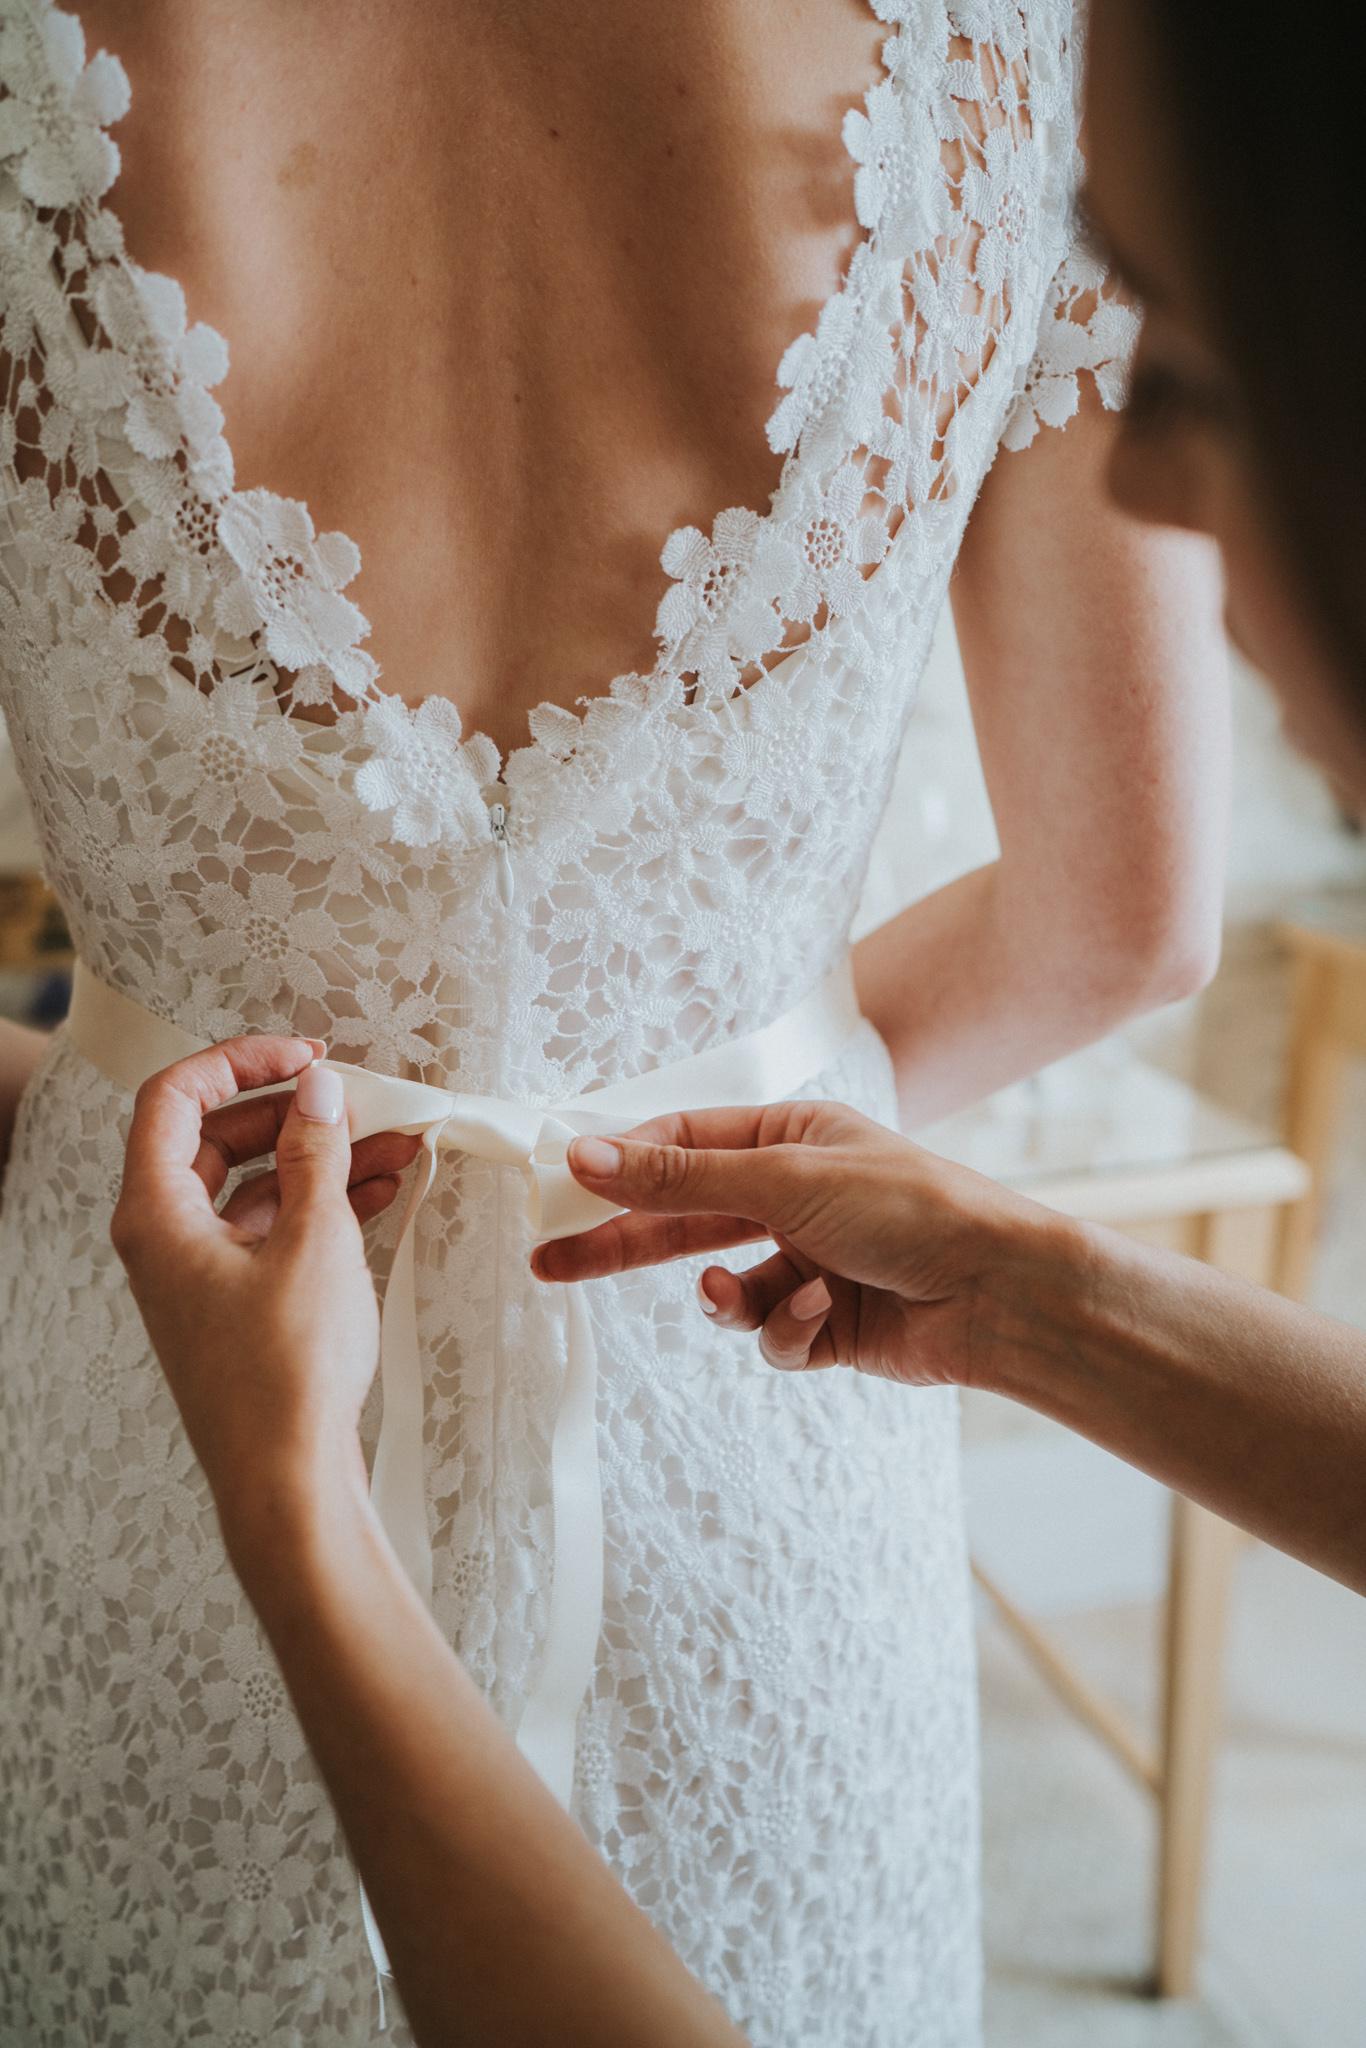 Grace-Elizabeth-Georgie-Amalaketu-Firstsite-Colchester-Essex-Boho-Buddhist-Wedding-Alternative-Wedding-Photography-Essex (28 of 100).jpg